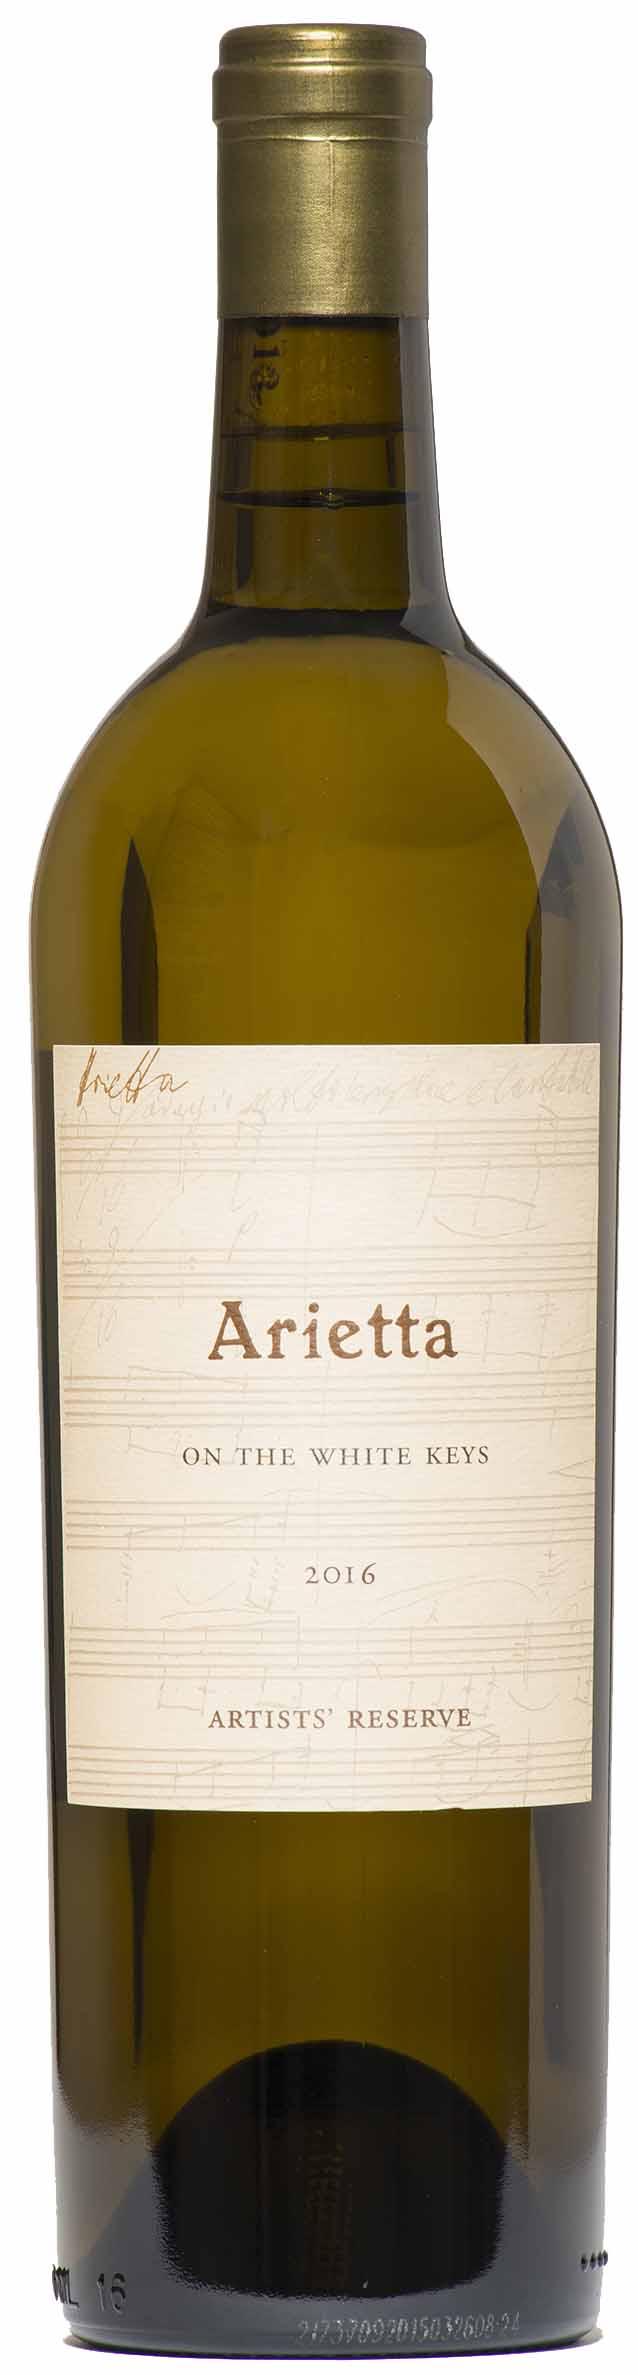 Arietta White Wine On the White Keys Artists Reserve 2014